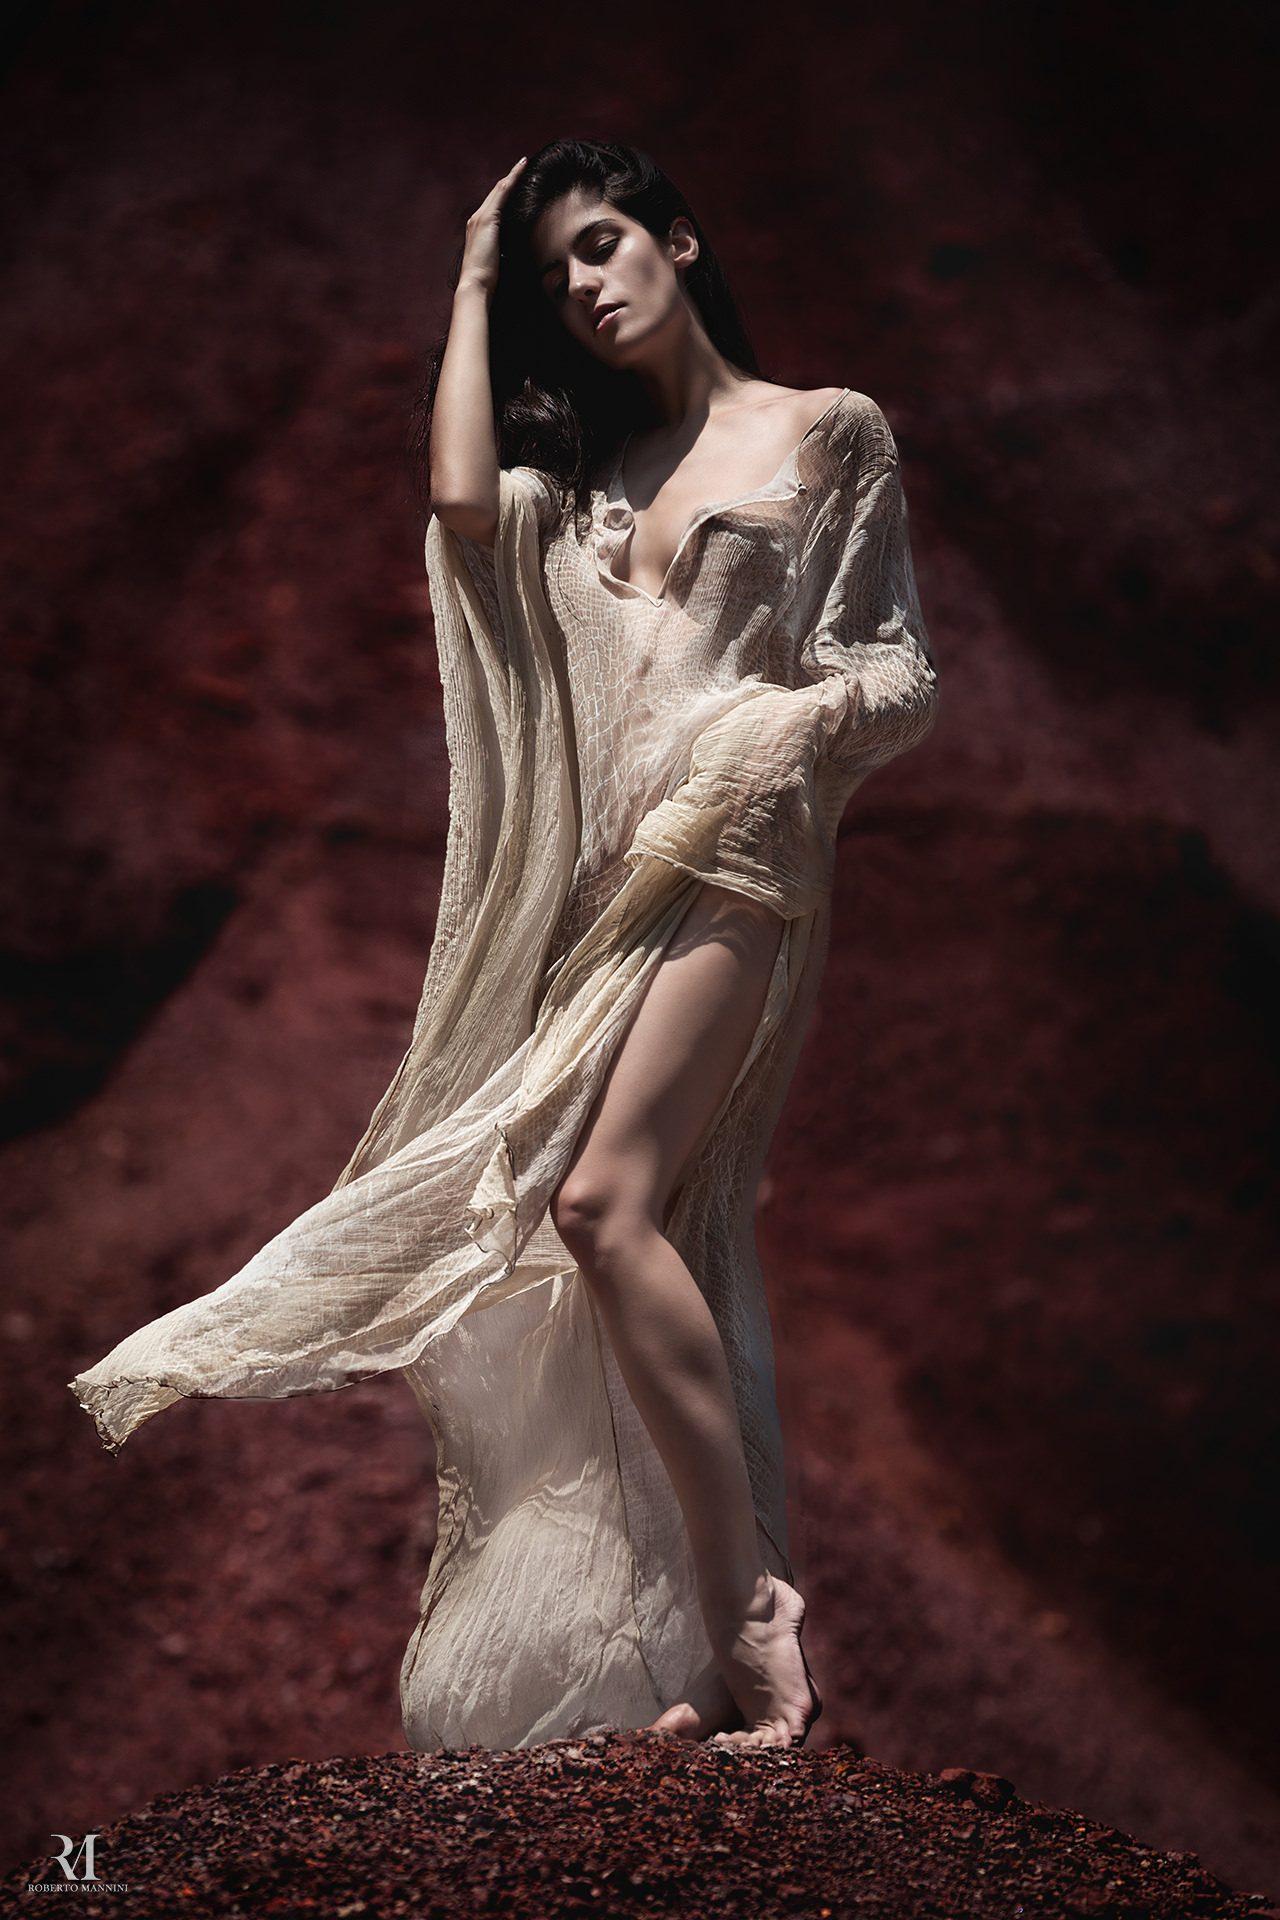 Roberto Mannini - Photographer